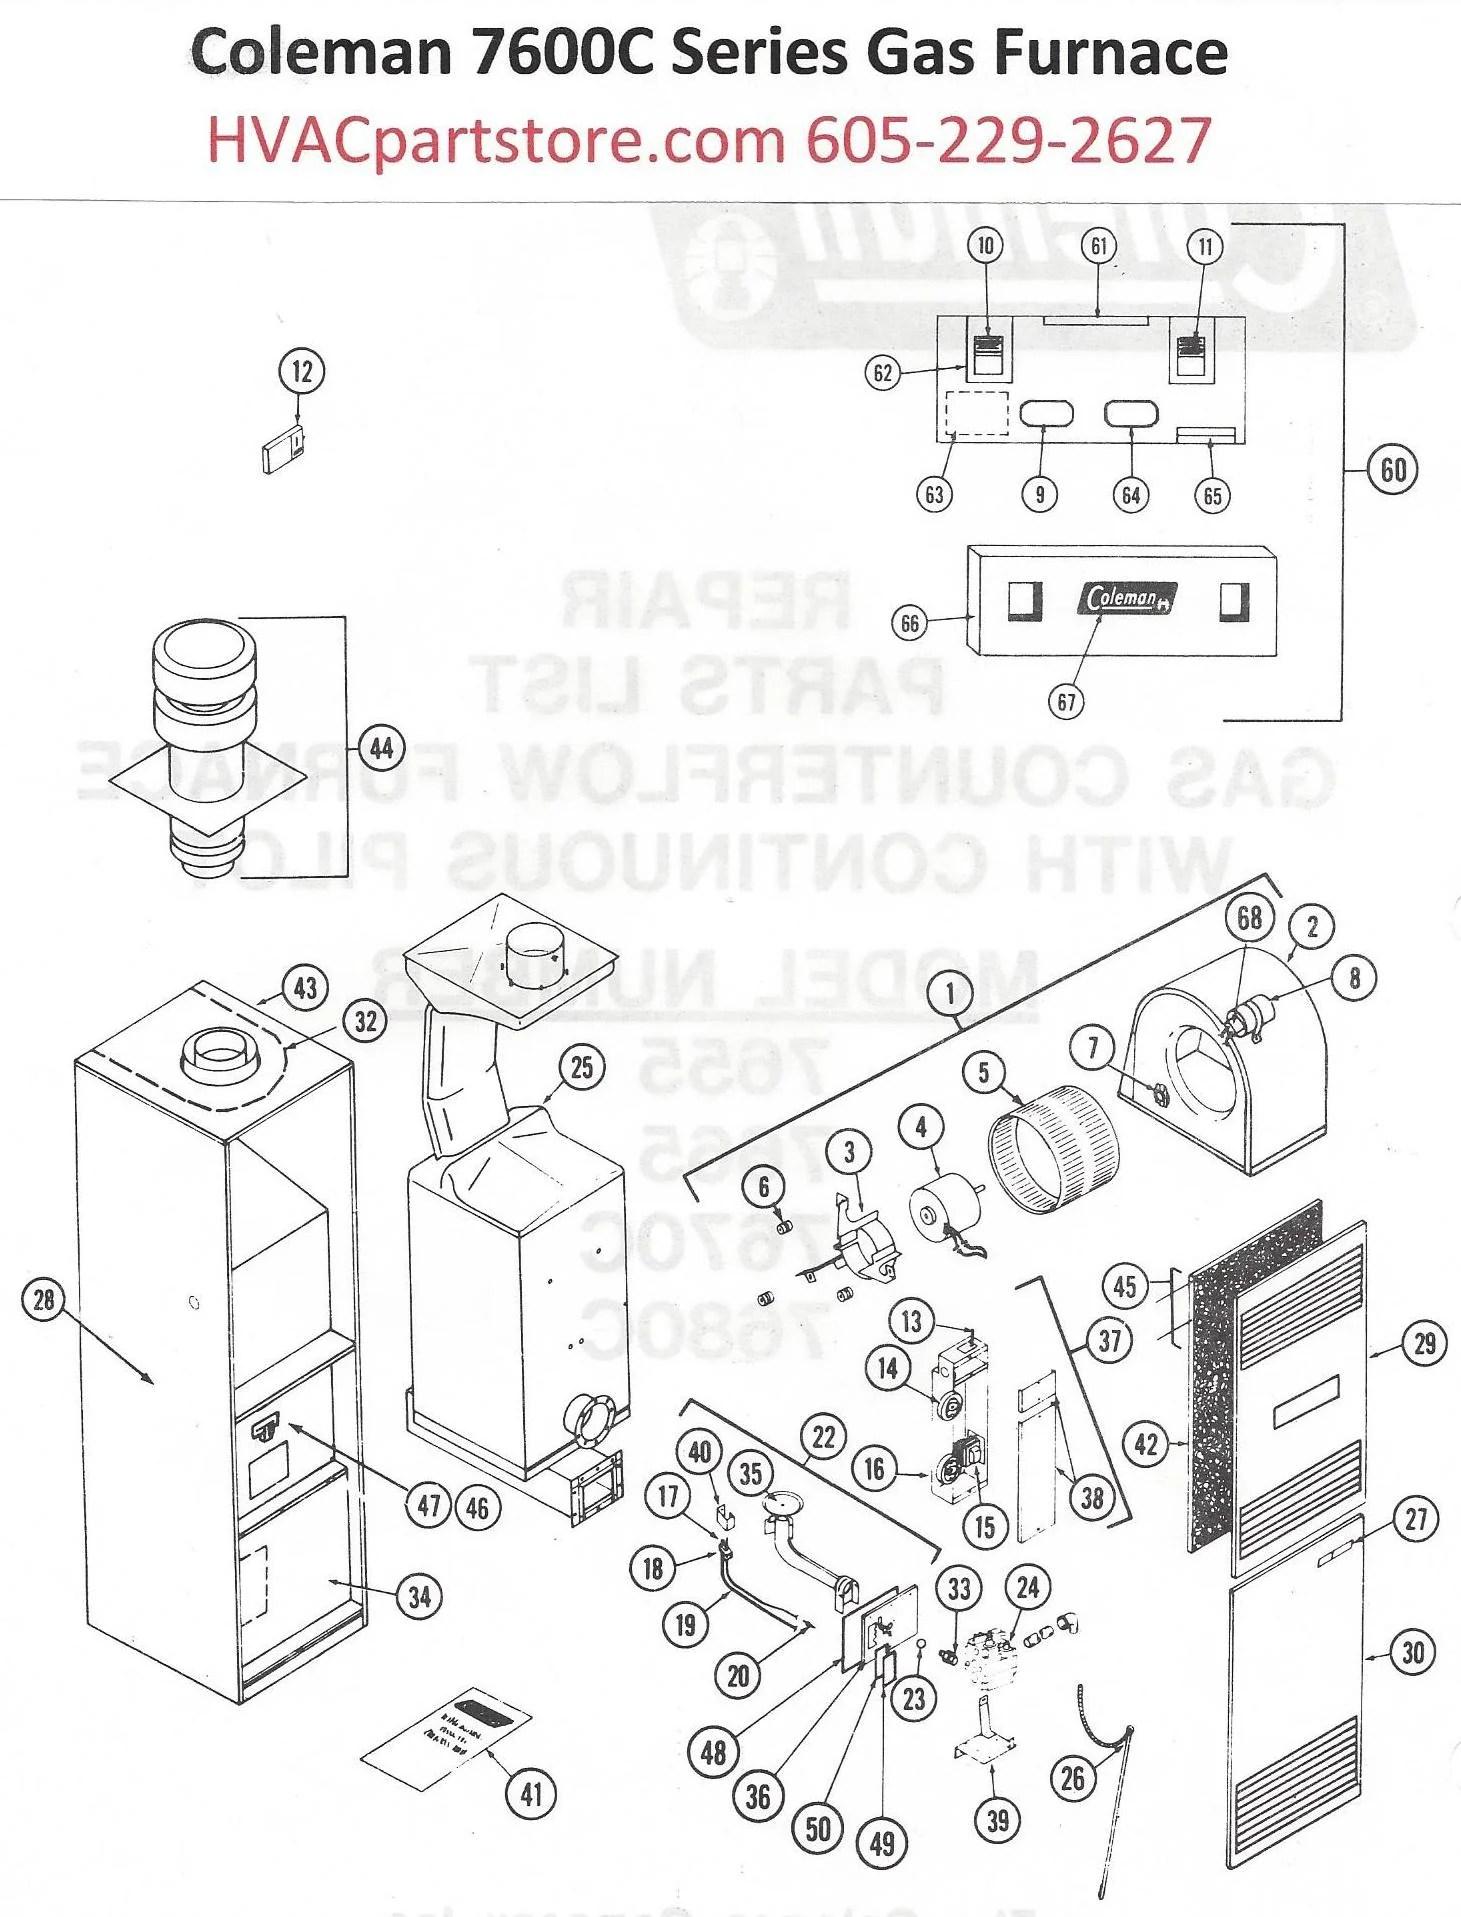 7670c856 coleman gas furnace parts hvacpartstore furnace parts diagram on gas wiring coleman for diagram model furnace [ 1461 x 1917 Pixel ]